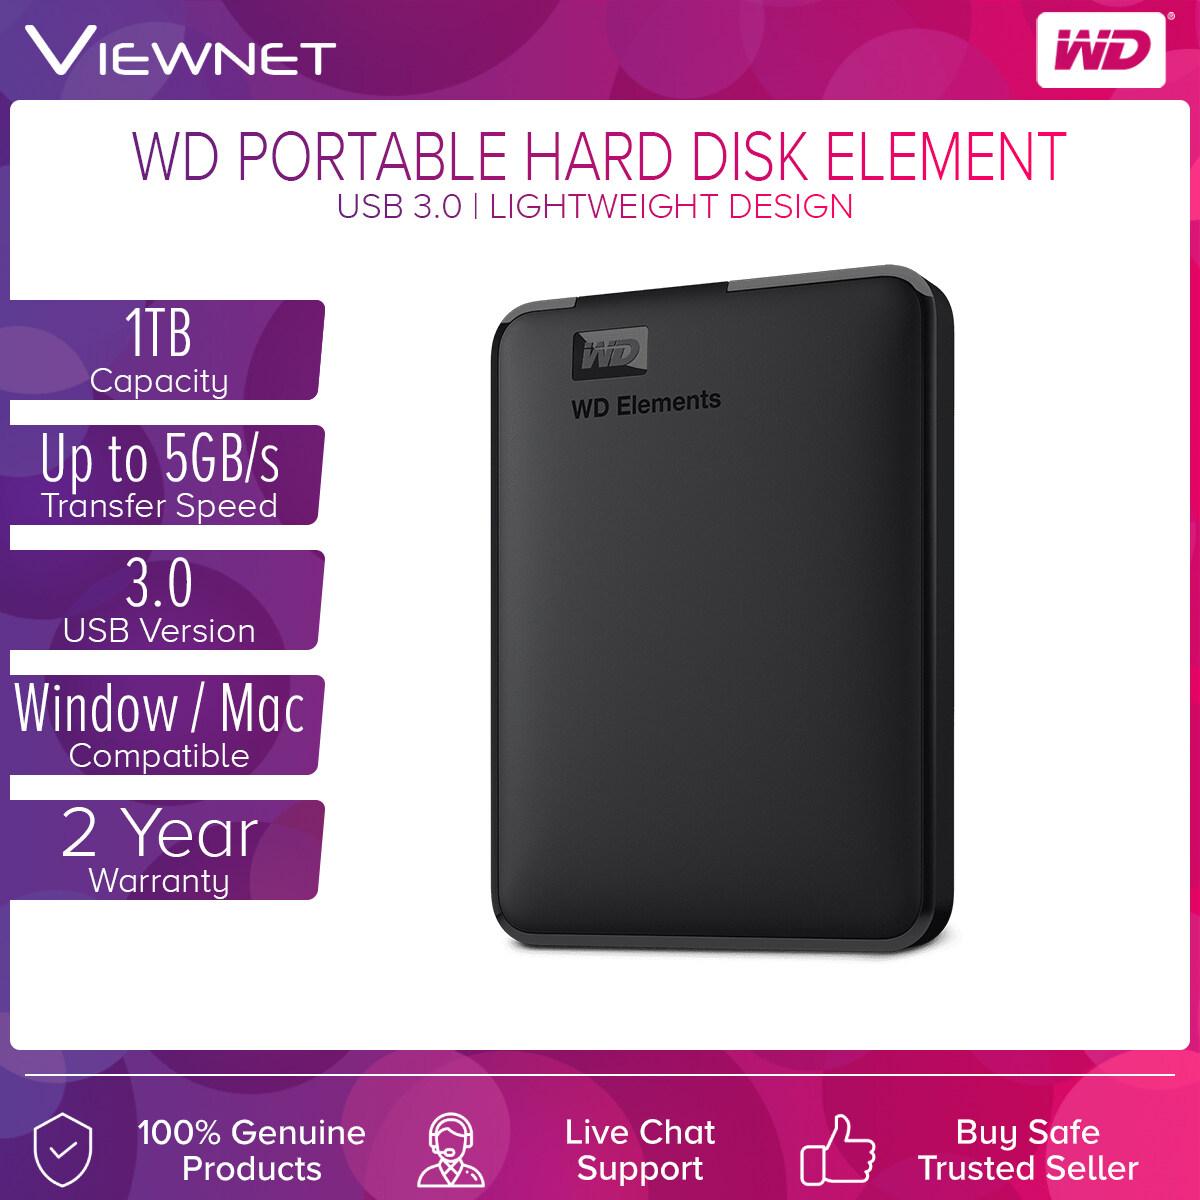 WD Western Digital Element 1TB Slim Portable External Hard Disk USB 3.0